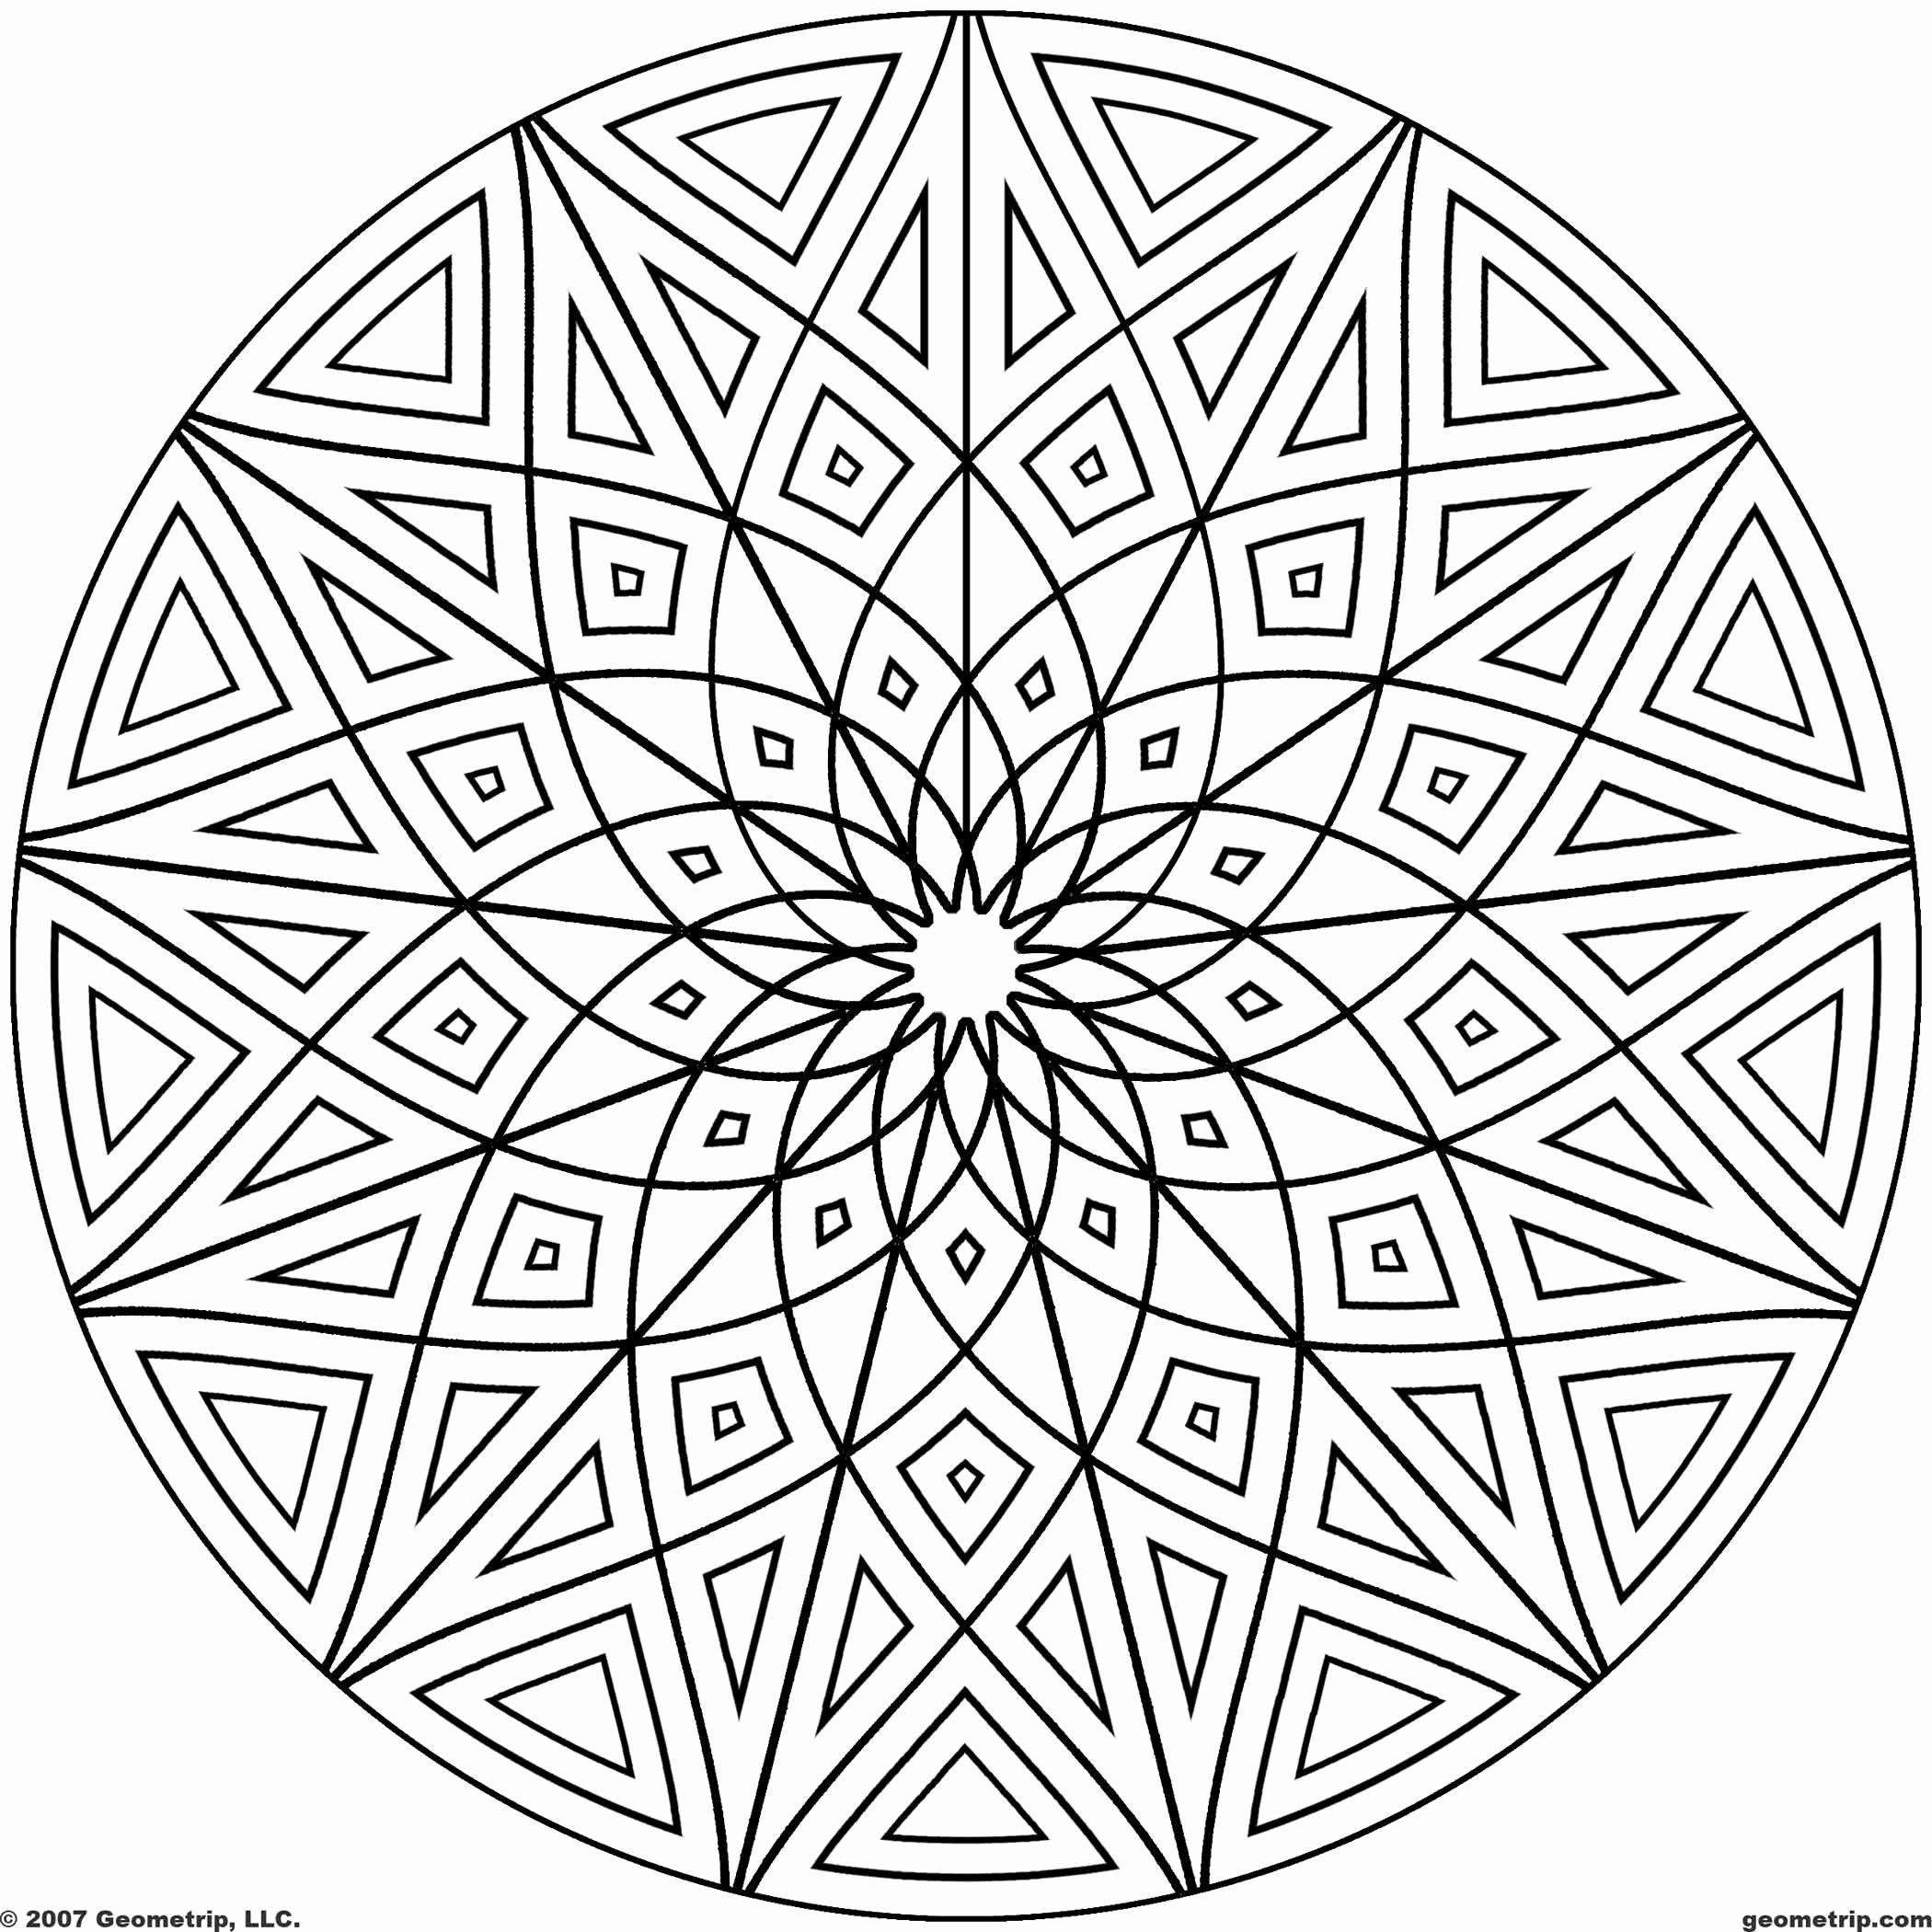 Starburst Mandala Geometric Coloring Pages Mandala Coloring Pages Cool Coloring Pages